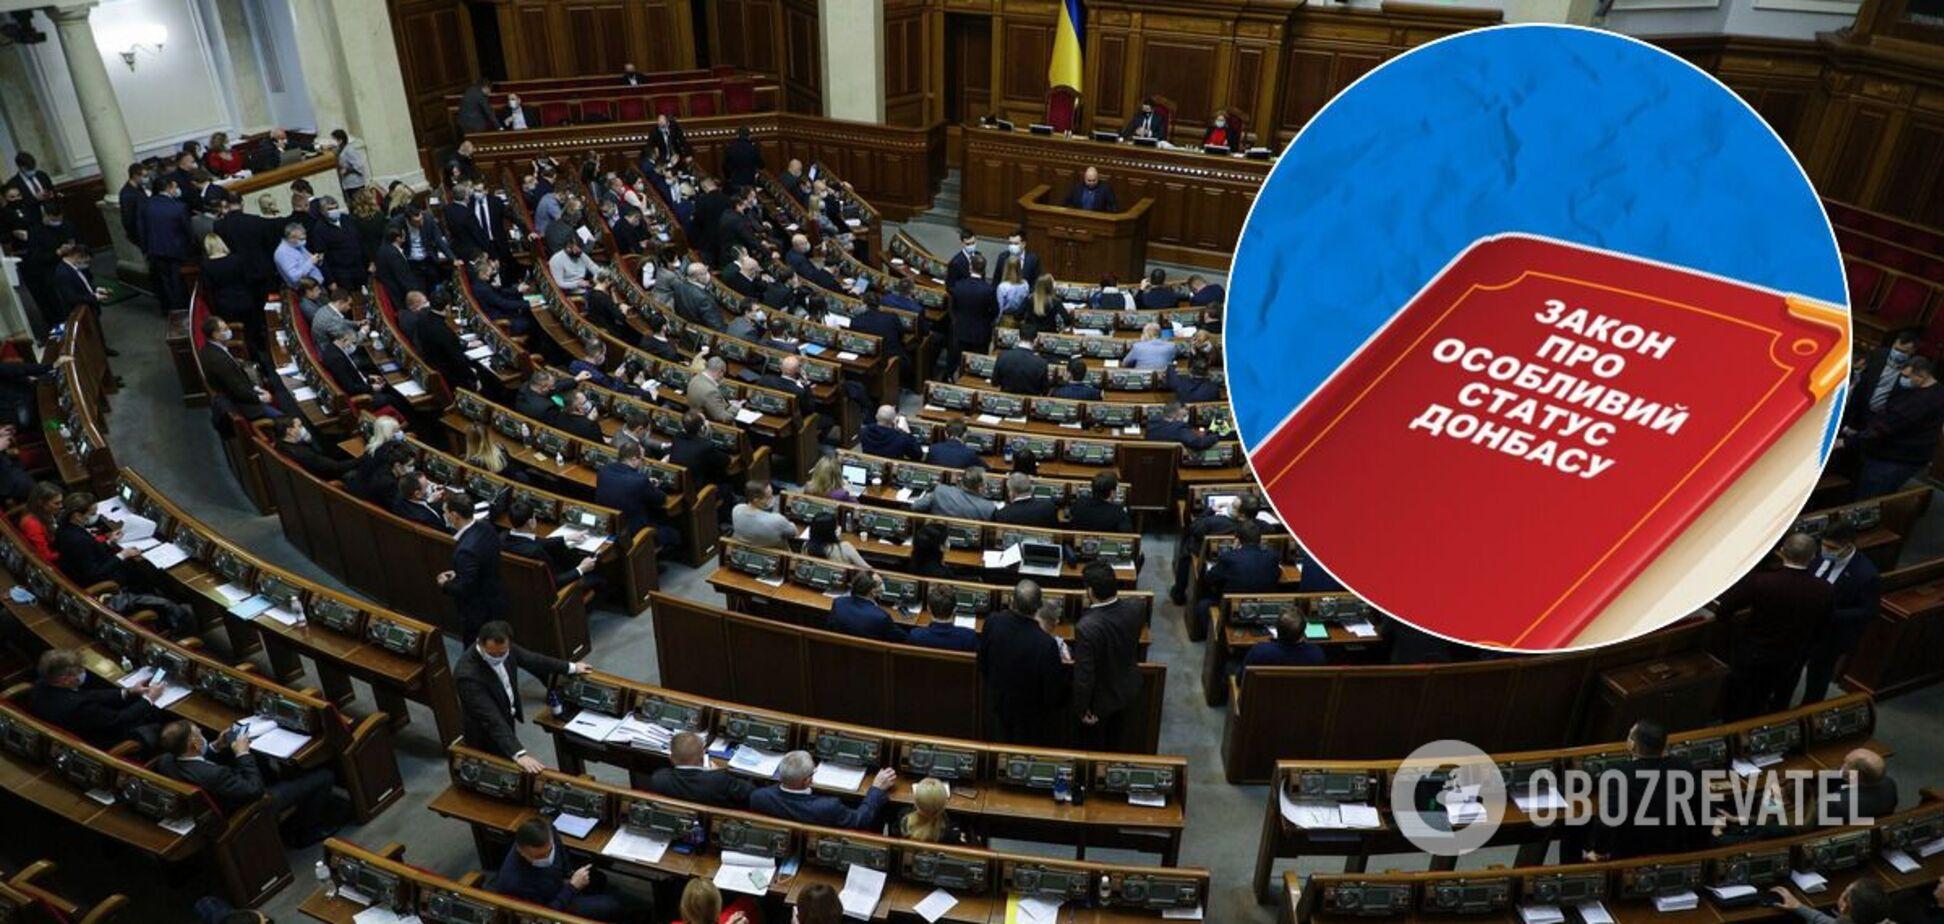 Нардепи продовжили ще на рік особливий статус Донбасу